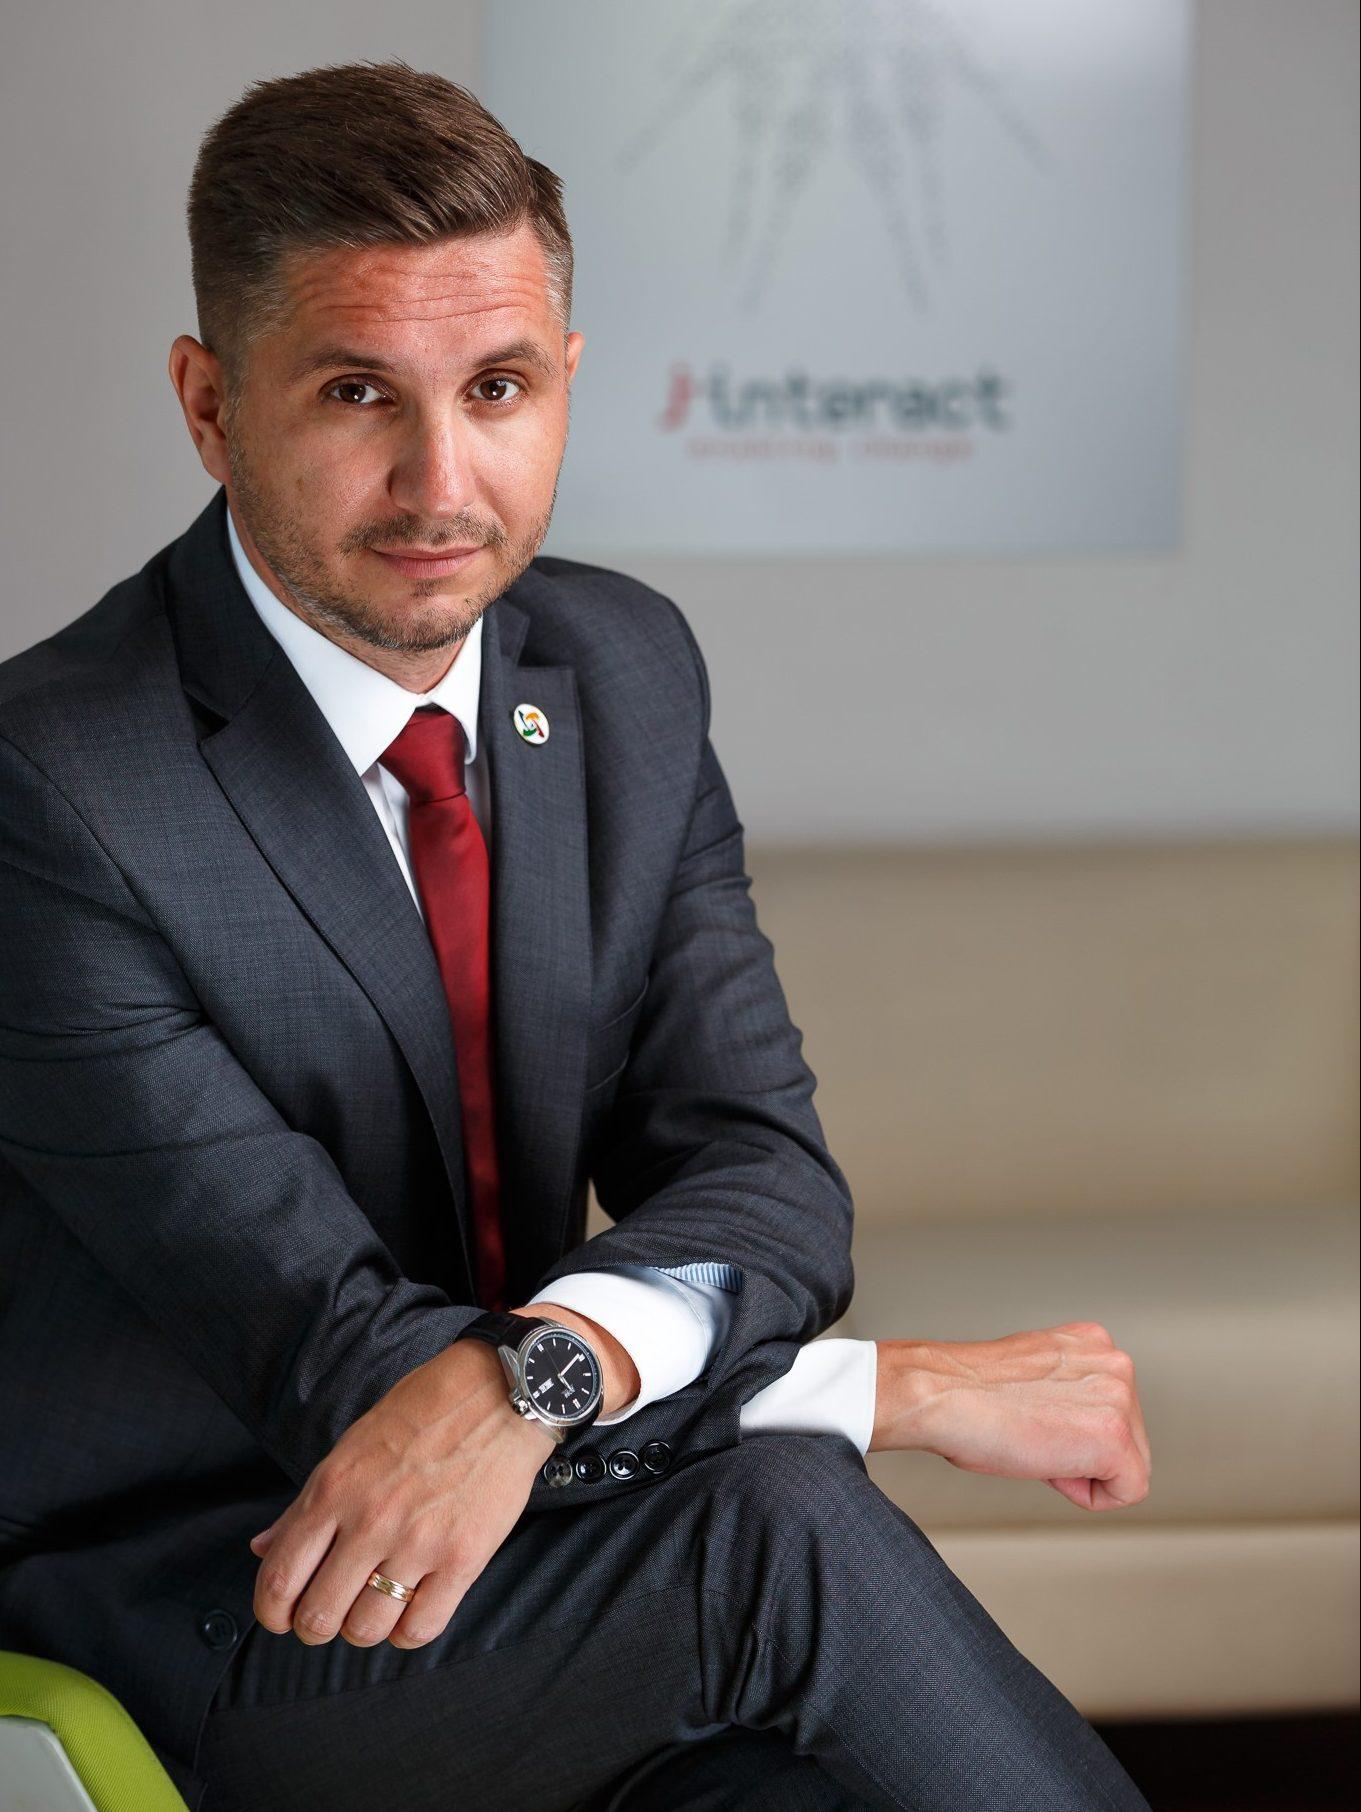 George Alexe a fost desemnat sa ocupe functia de Business Development Manager, in cadrul companiei Interact.